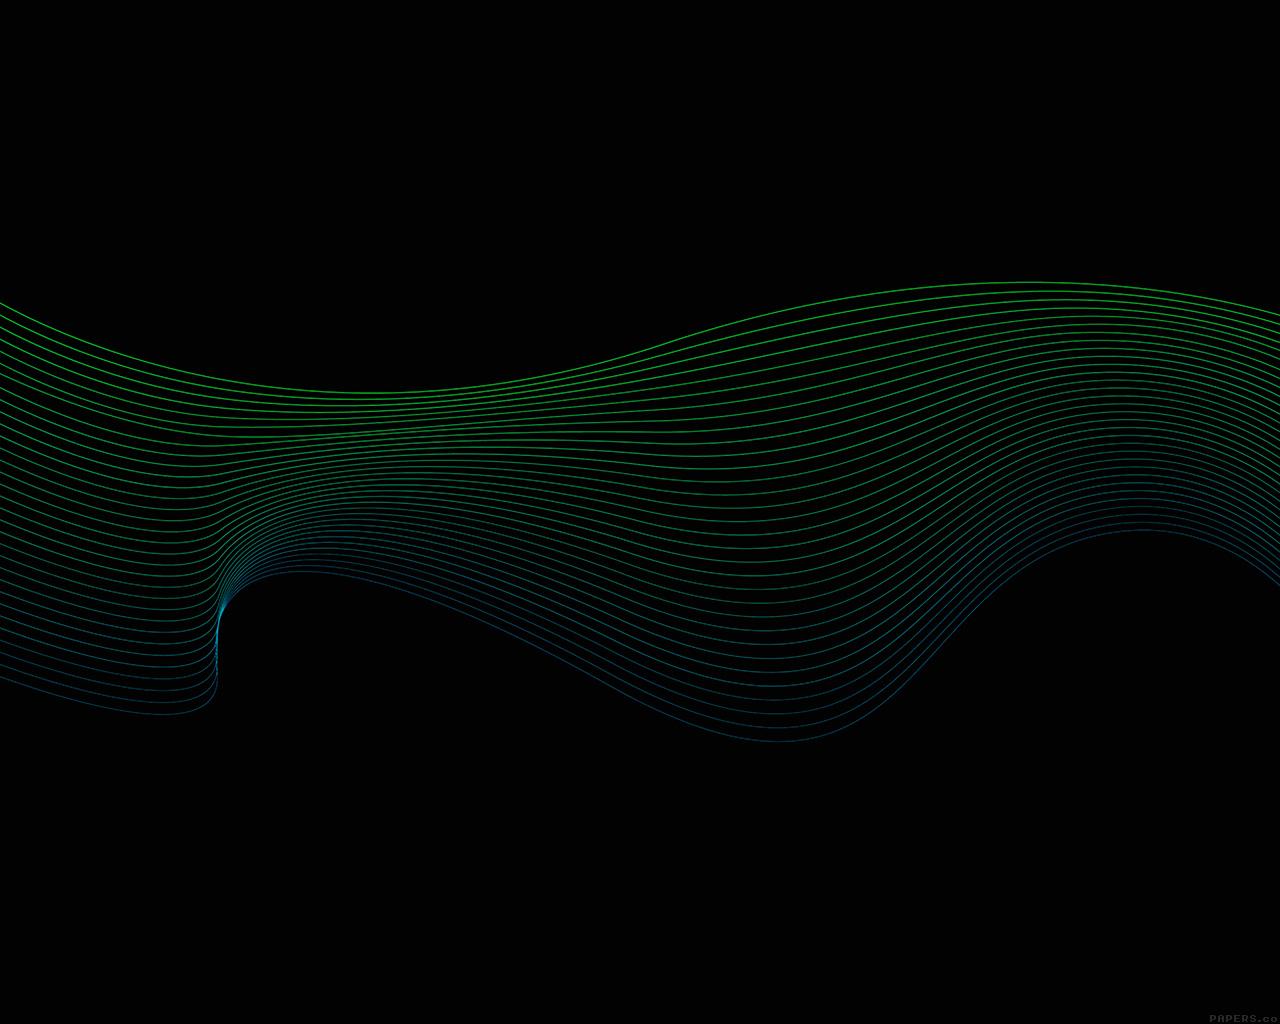 vf40-digital-noise-graphic dark-art-pattern-wallpaper